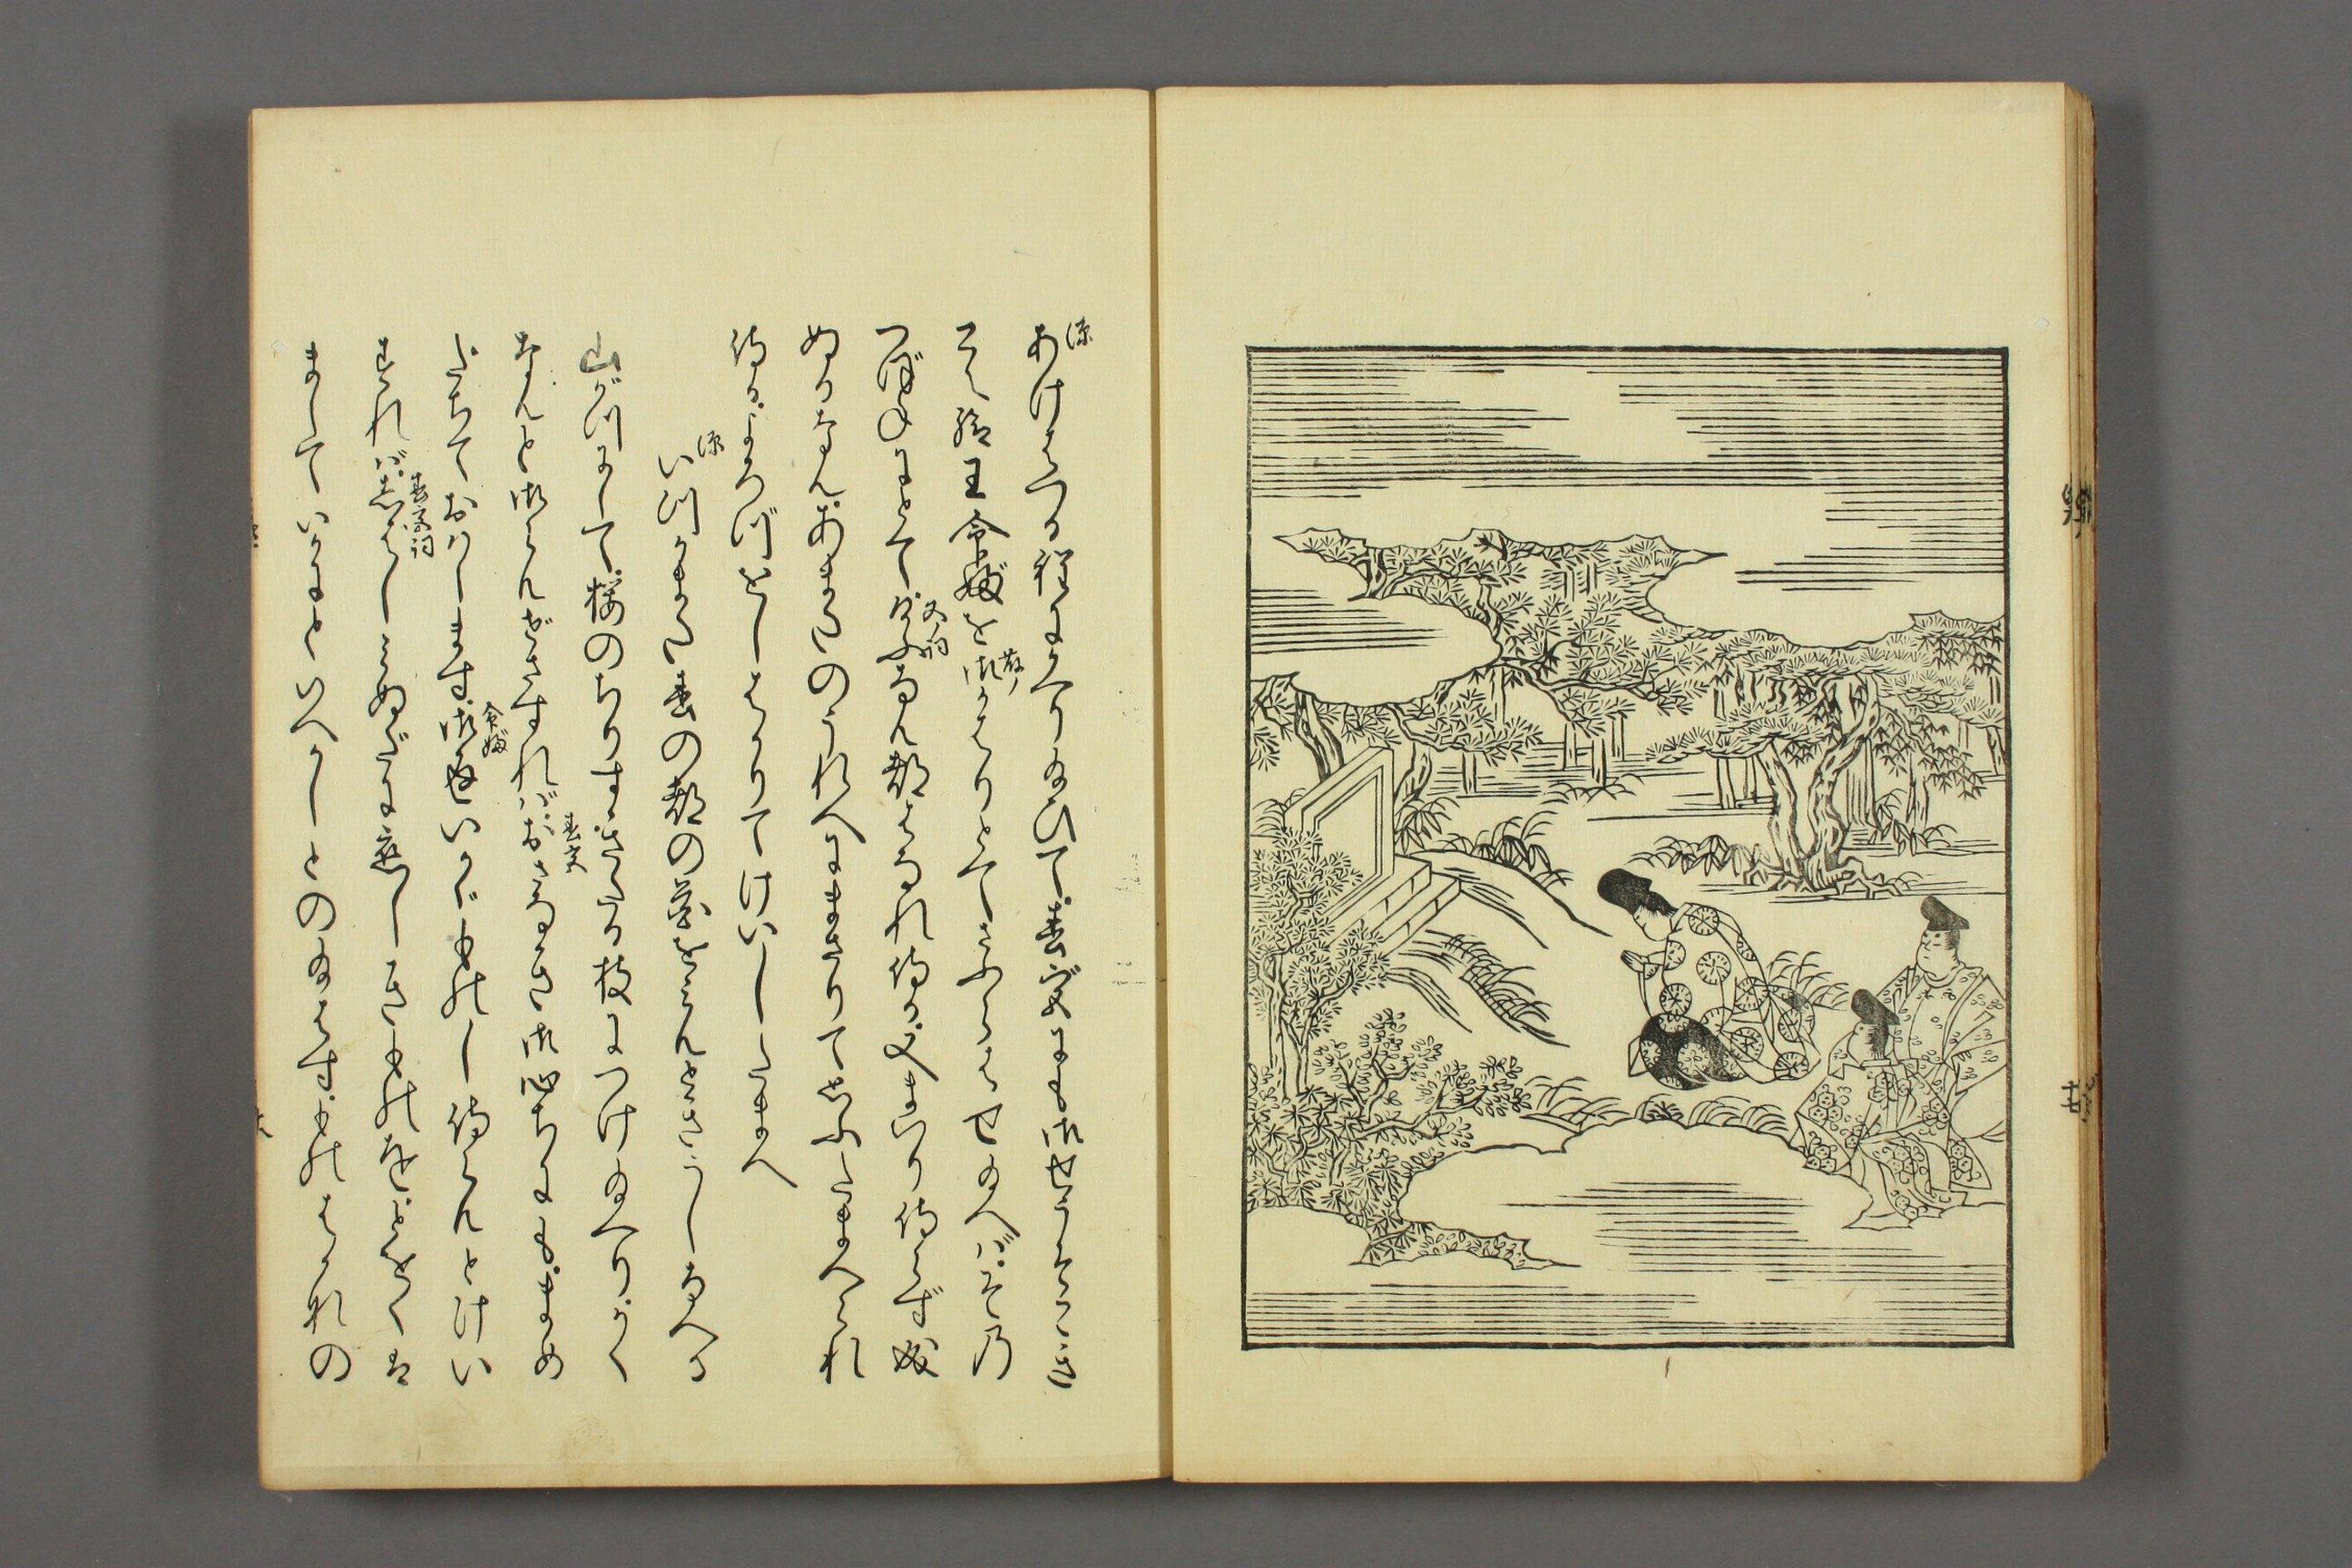 http://archive.wul.waseda.ac.jp/kosho/bunko30/bunko30_a0007/bunko30_a0007_0012/bunko30_a0007_0012_p0019.jpg